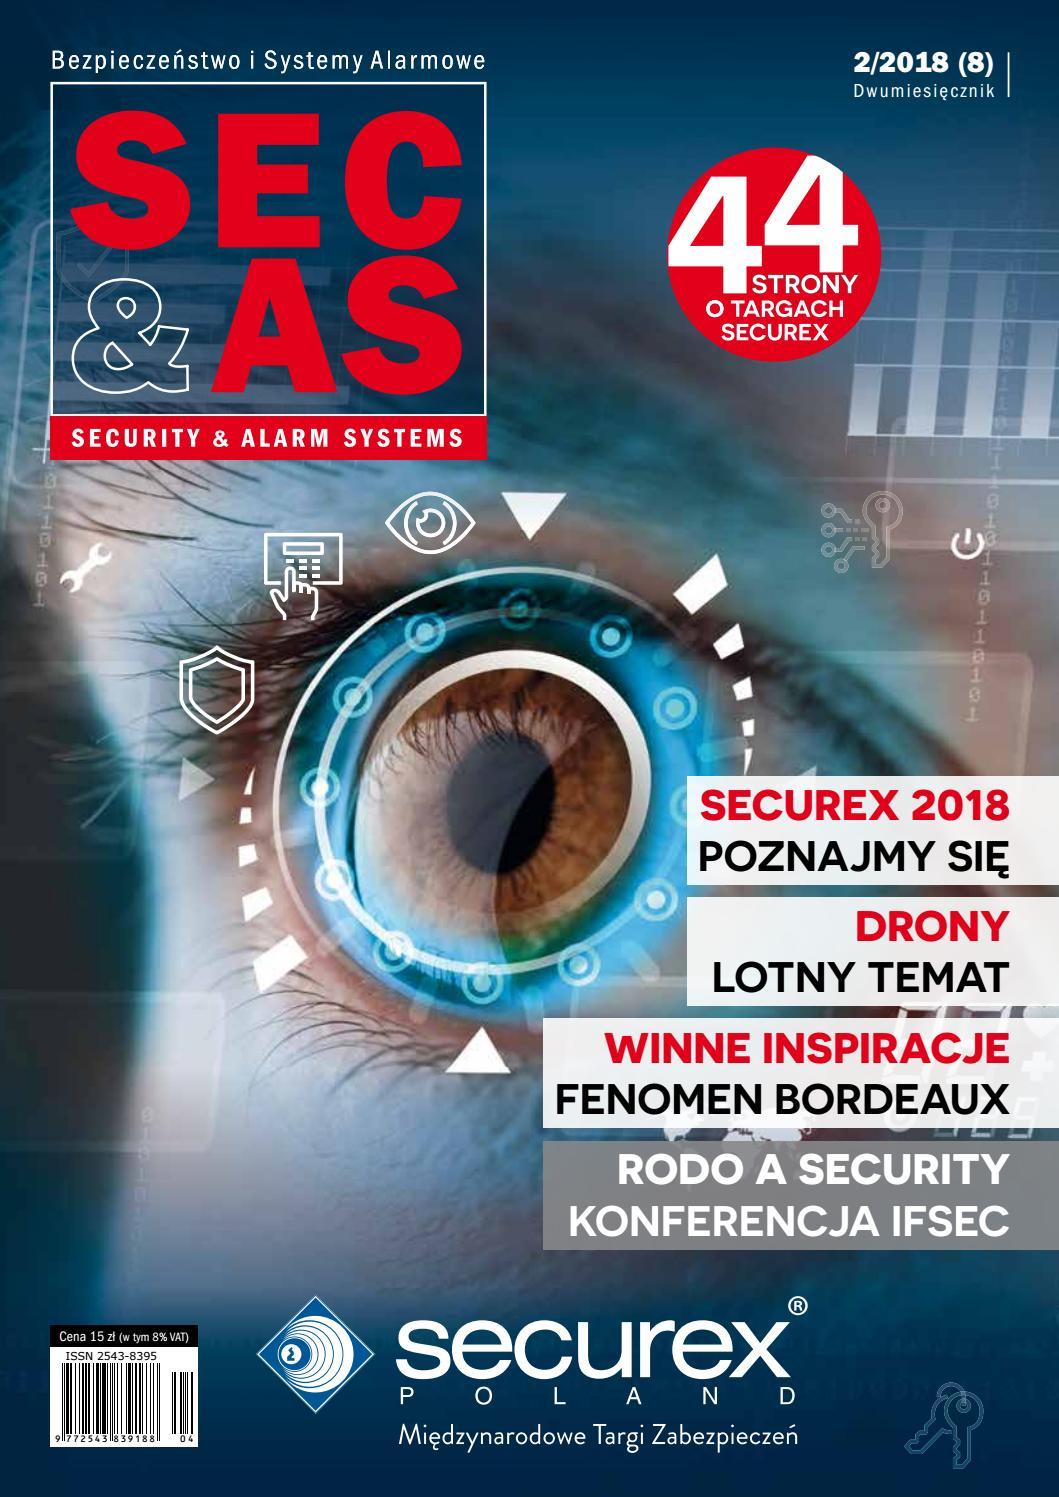 2319a42ed566e8 SEC&AS (SECURITY & ALARM SYSTEMS) 2/2018 (8) by PISA (Polska Izba Systemów  Alarmowych) - issuu